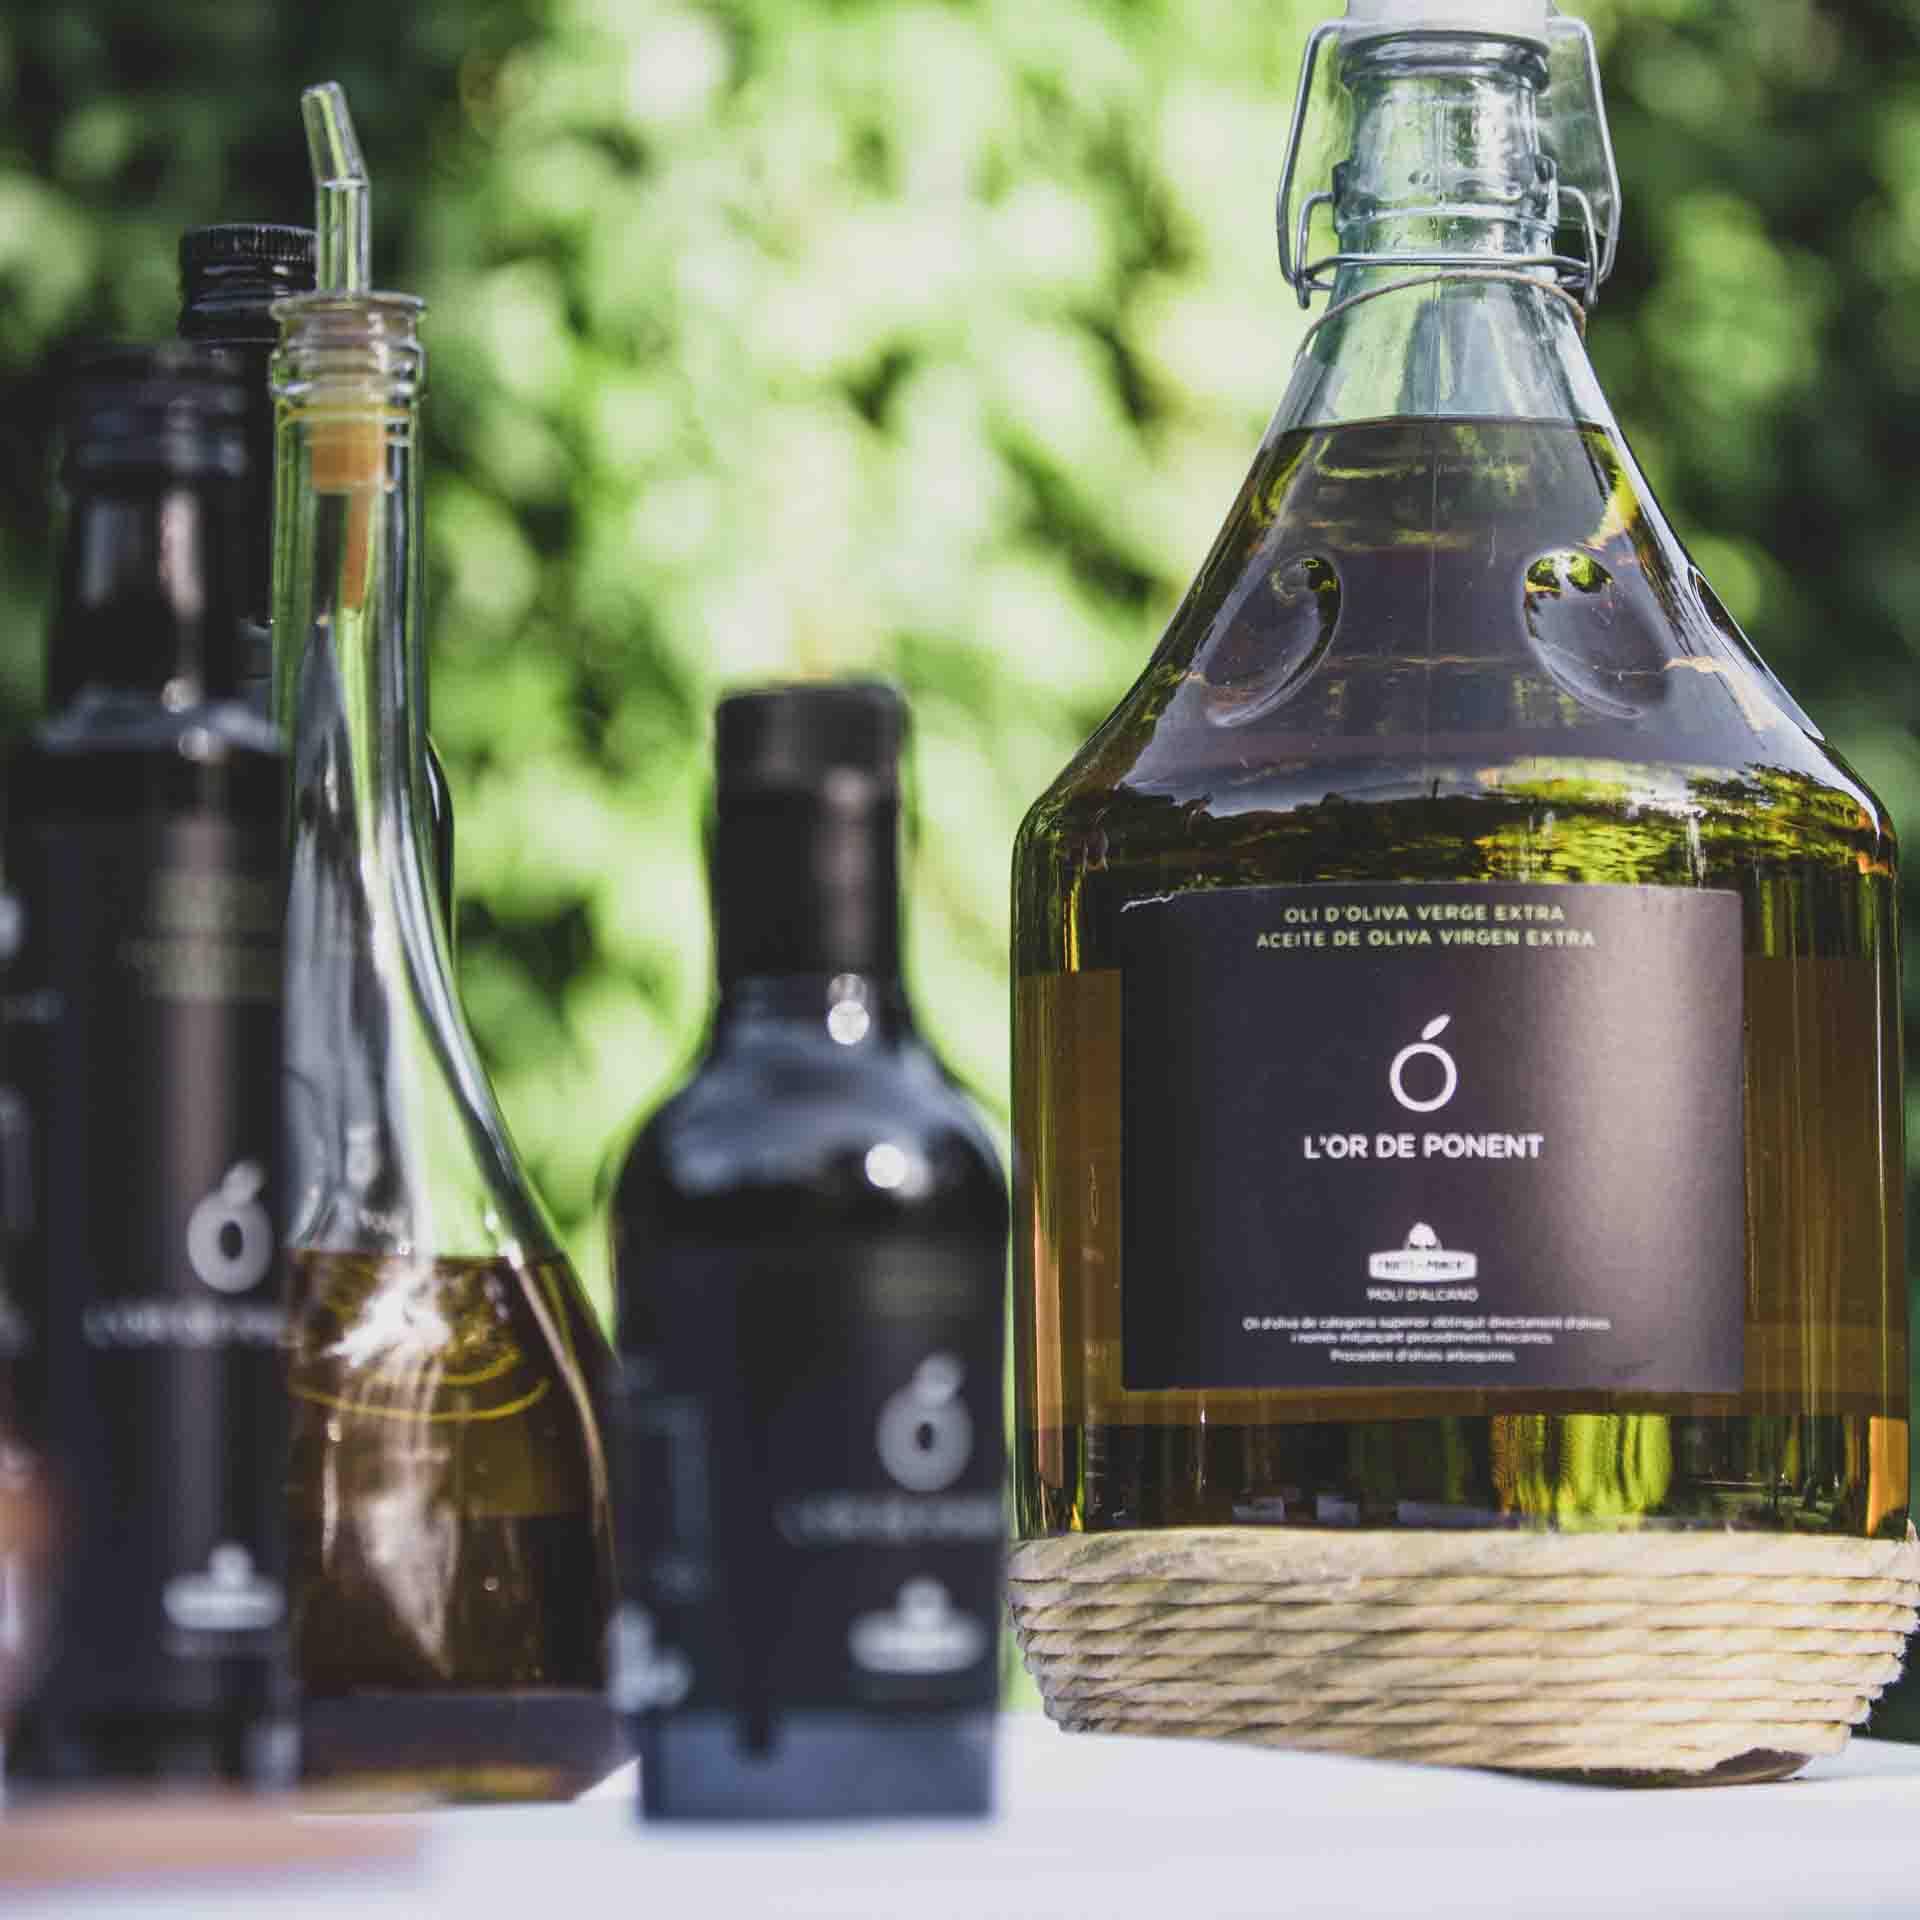 or-de-ponent-producte-oli-oliva-verge-extra-categoria